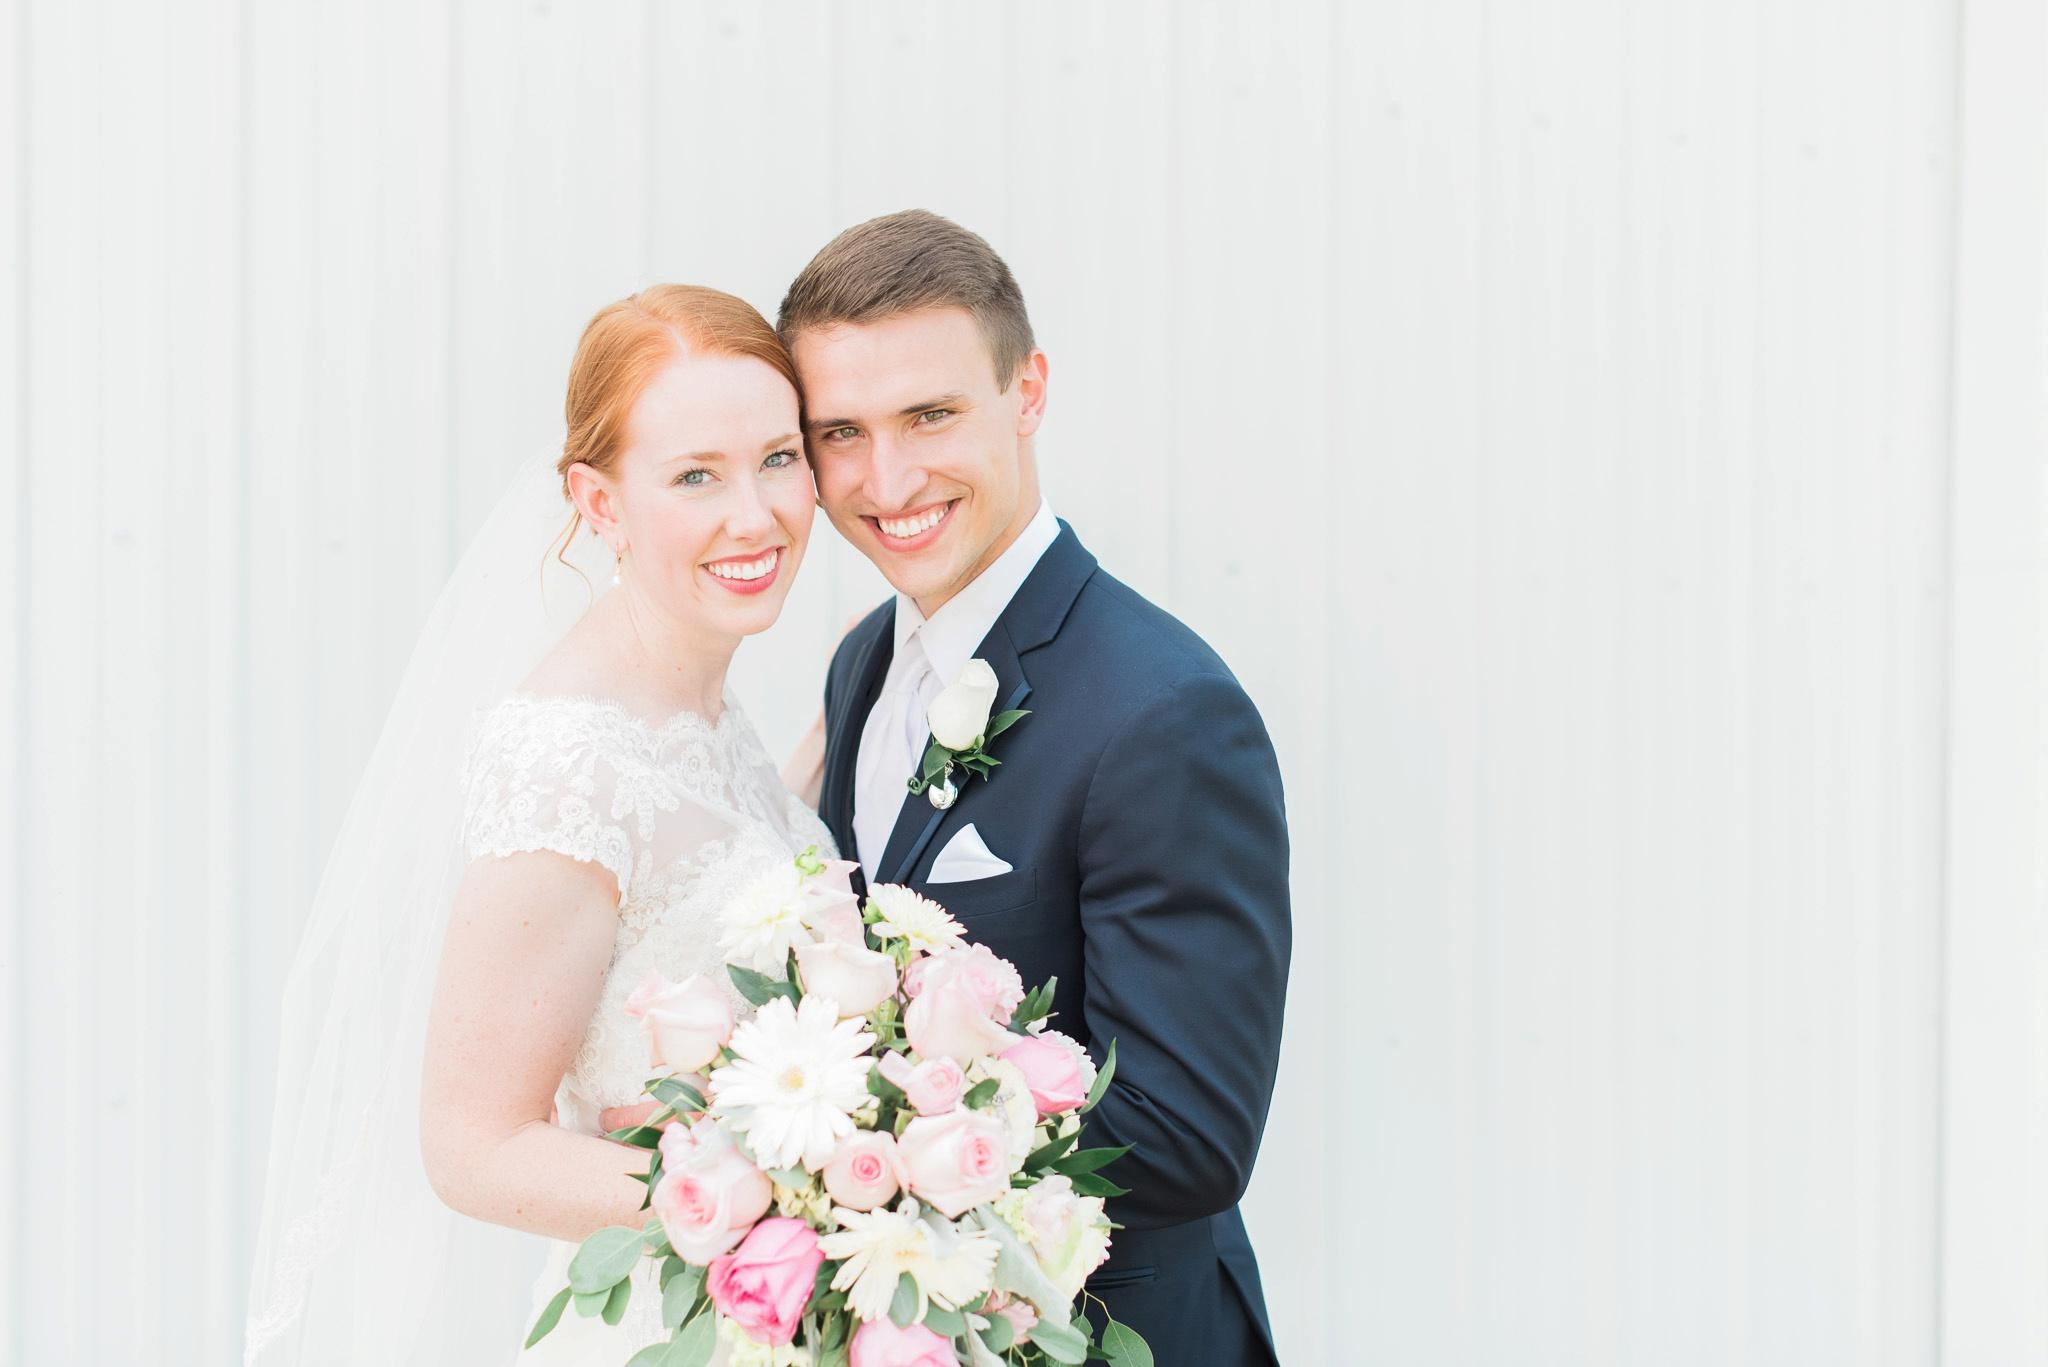 sunbury-ohio-wedding-hannah-johnathan_0077.jpg